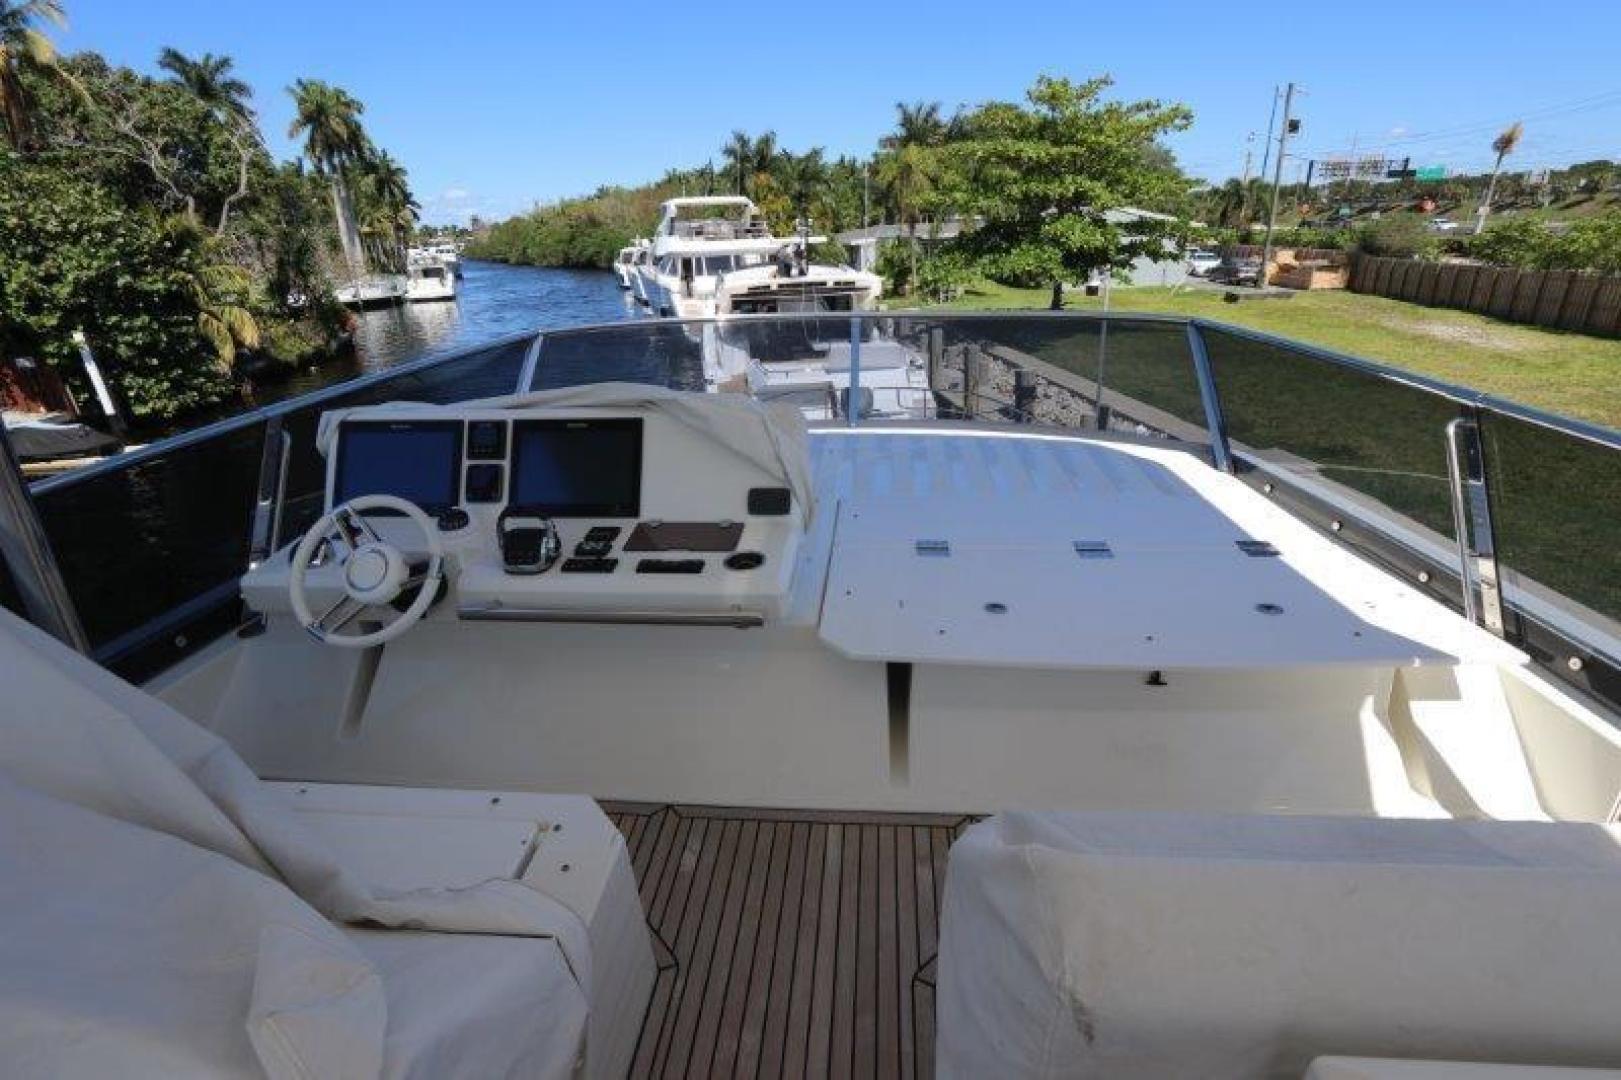 Prestige-Motoryacht 2017-Breathe Easy Fort Lauderdale-Florida-United States-1303868   Thumbnail